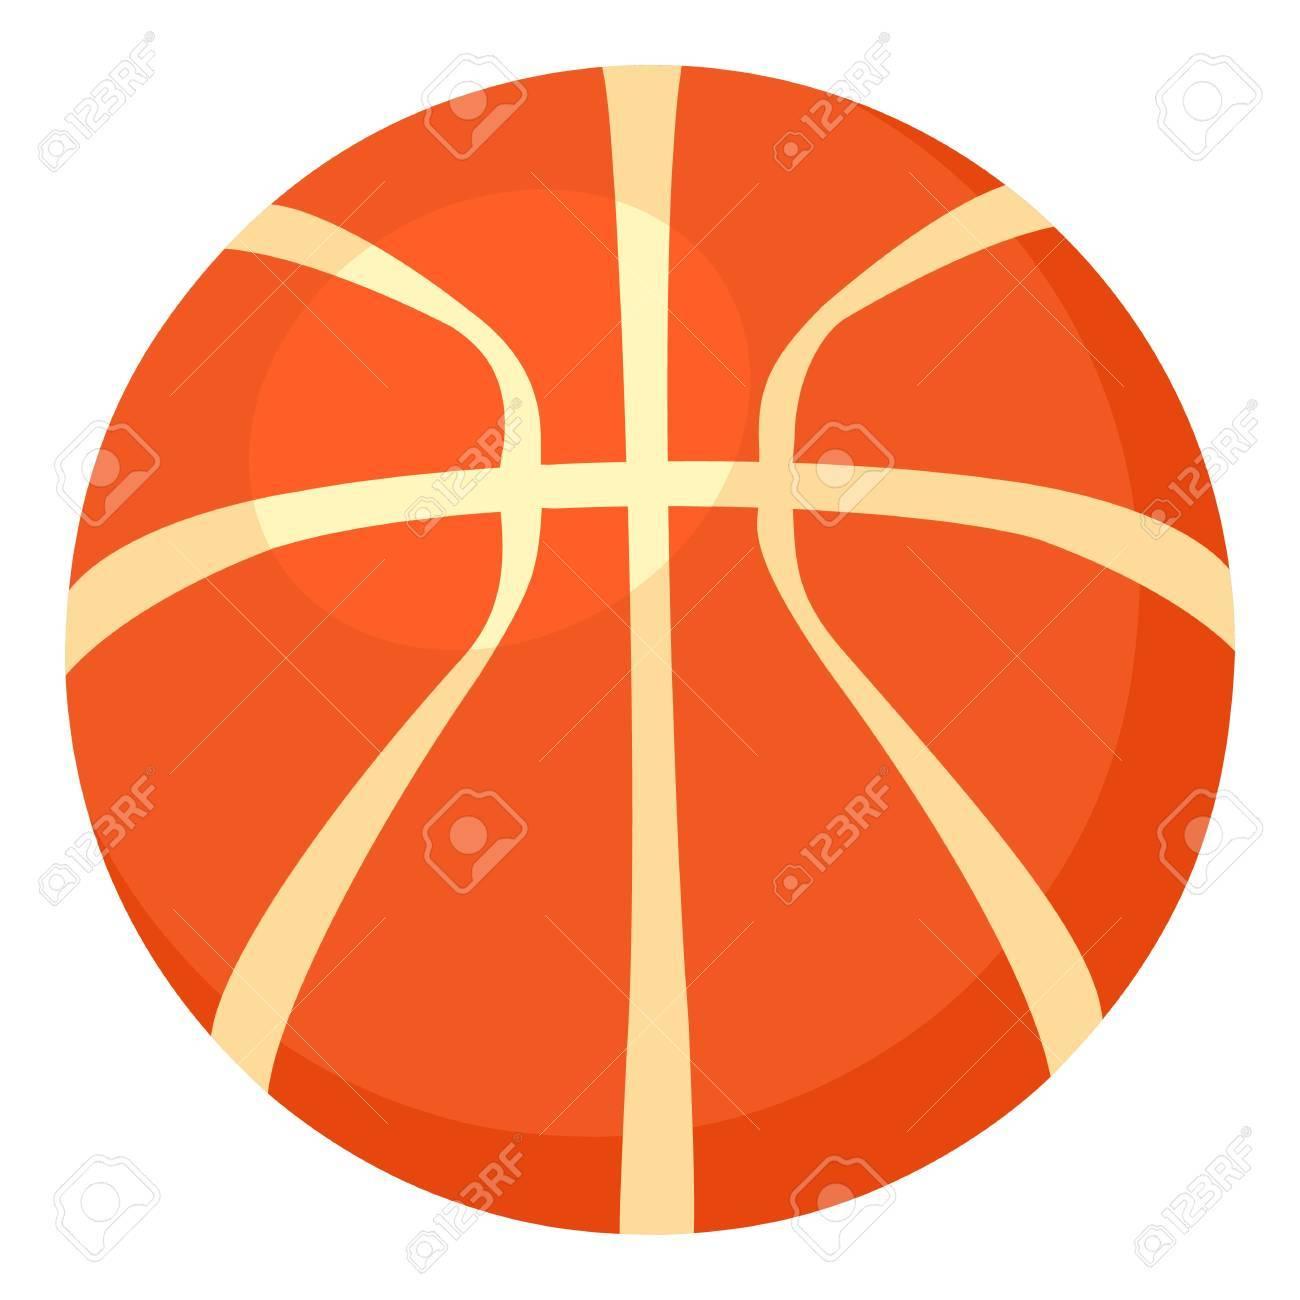 Basketball Ball Icon Cartoon Style Illustration